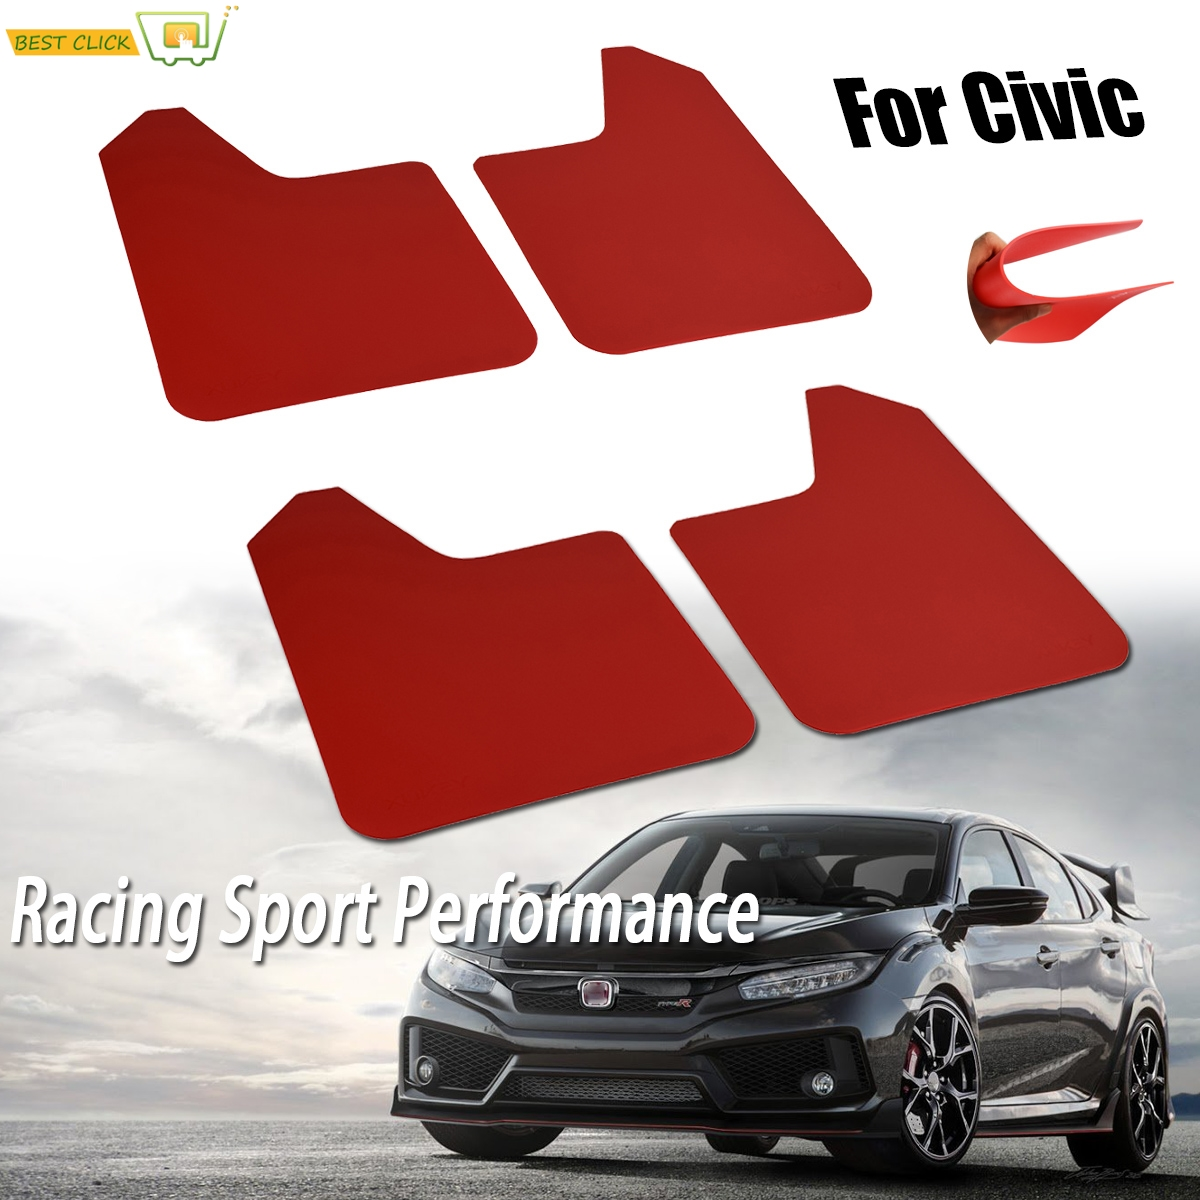 Honda Parts Genuine 3D BADGE Side EMBLEM NEW DESIGN CRX CRV CIVIC RS S TYPE R S